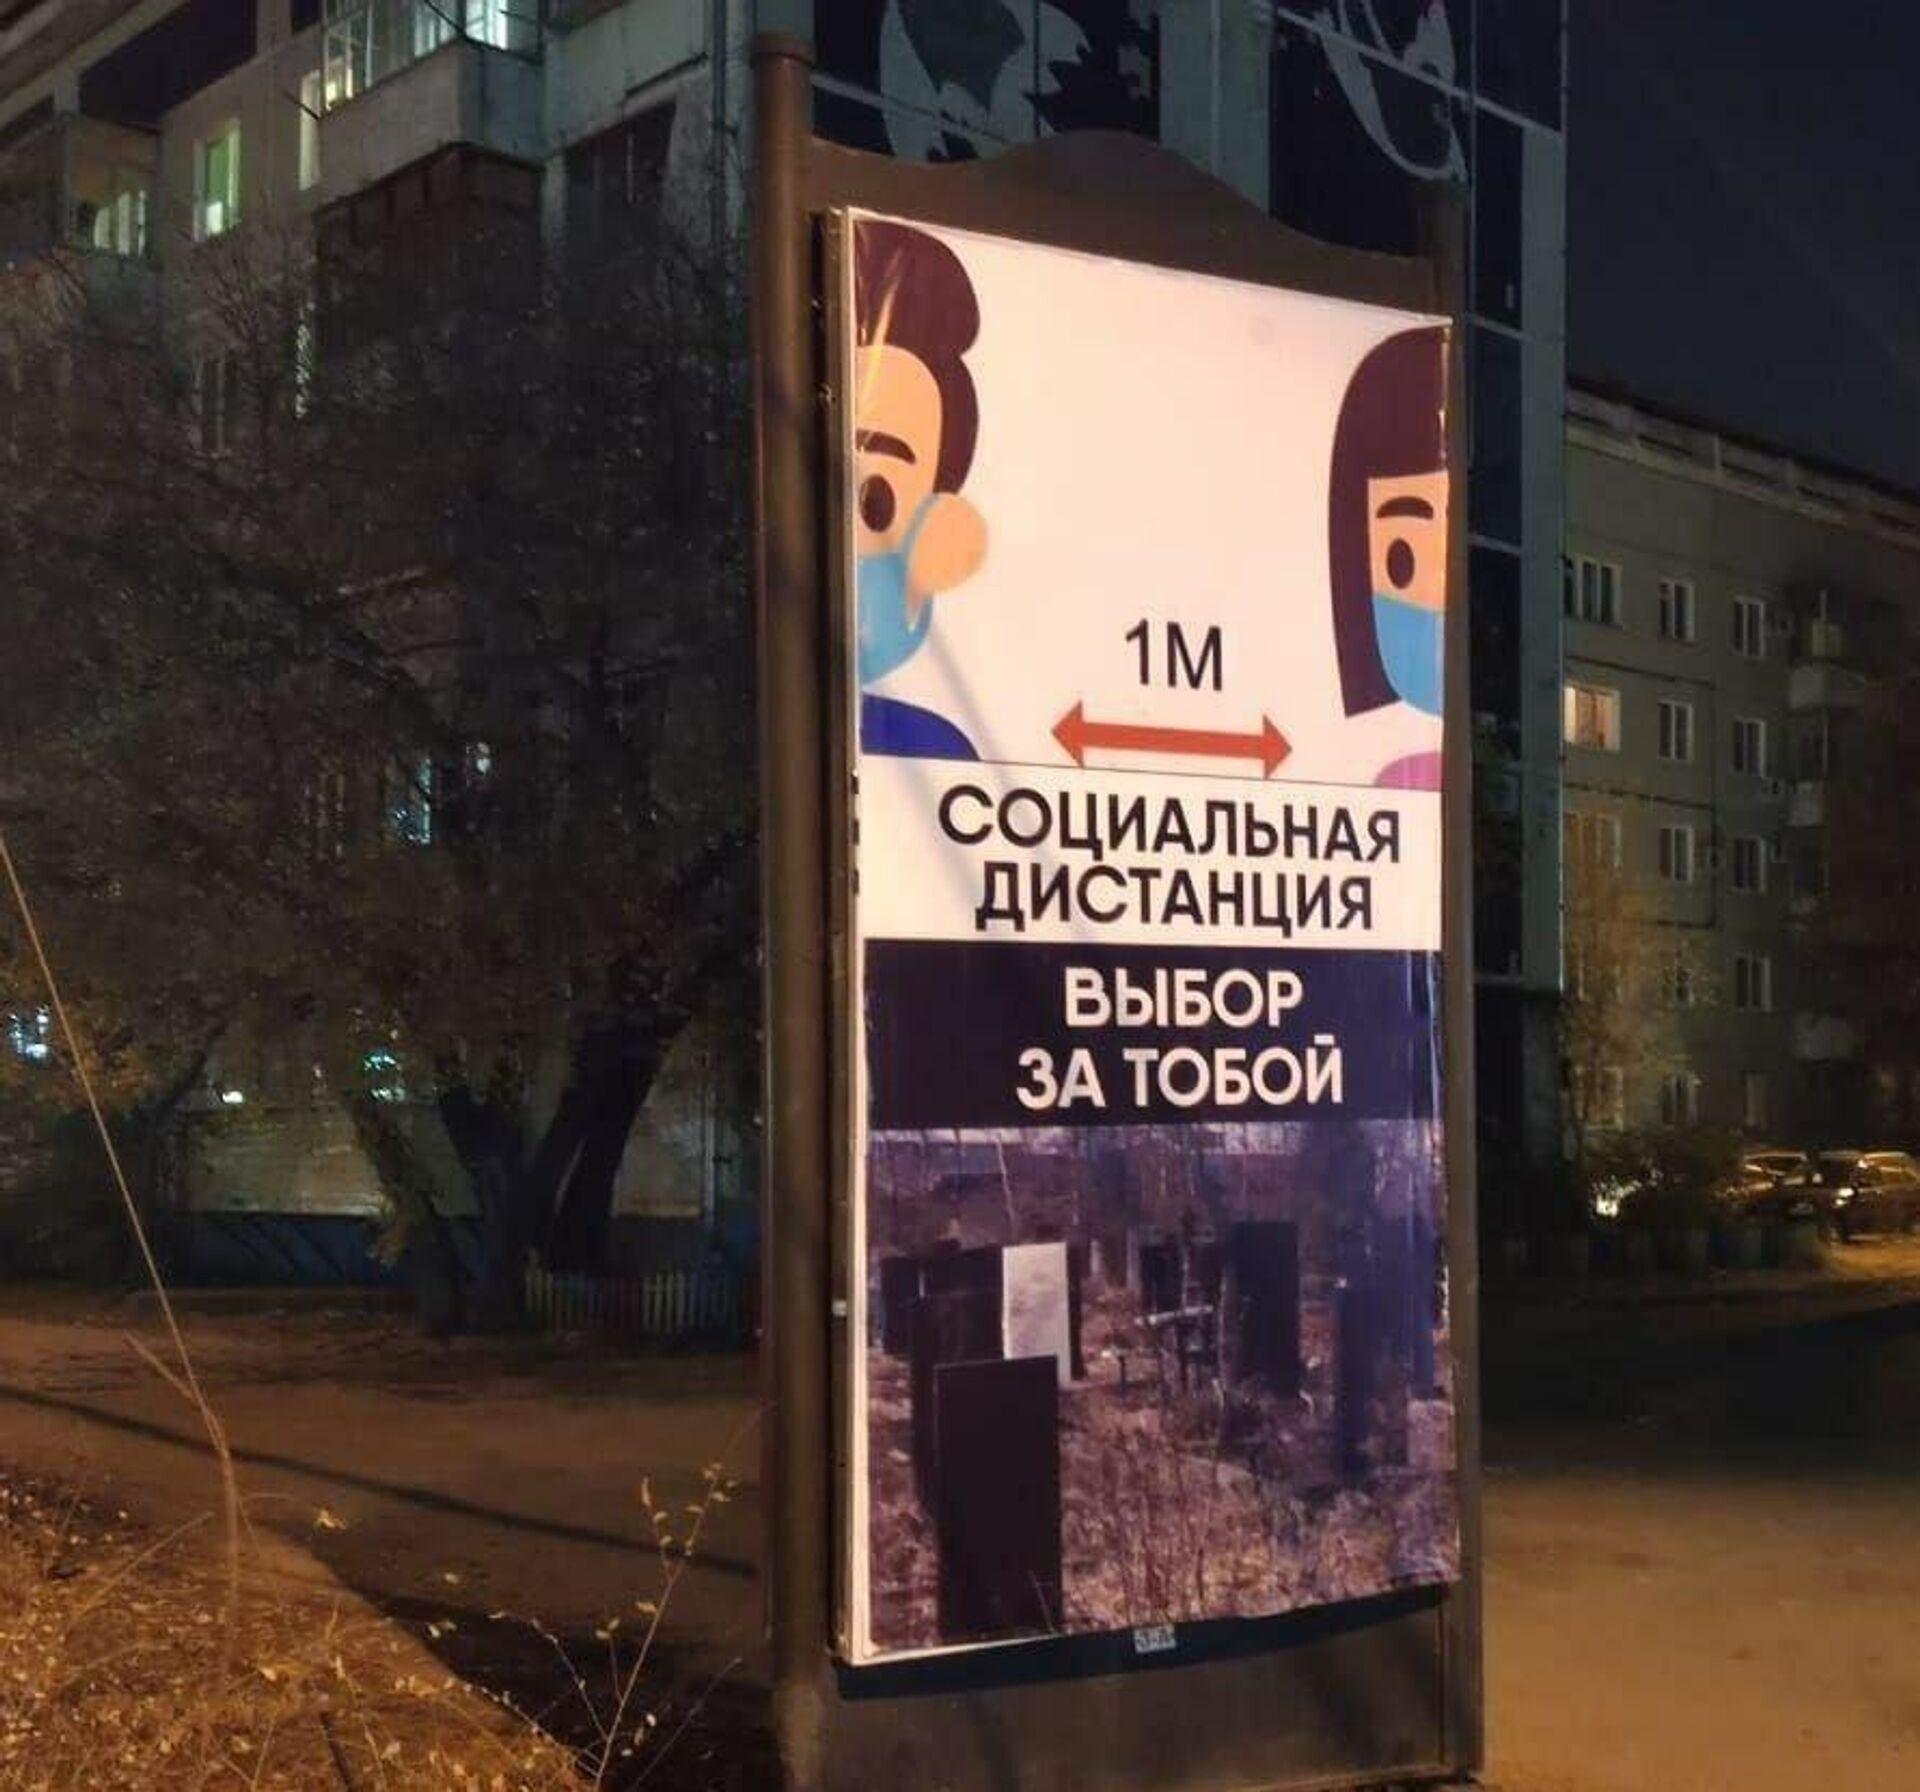 Реклама в Благовещенске - РИА Новости, 1920, 21.10.2020